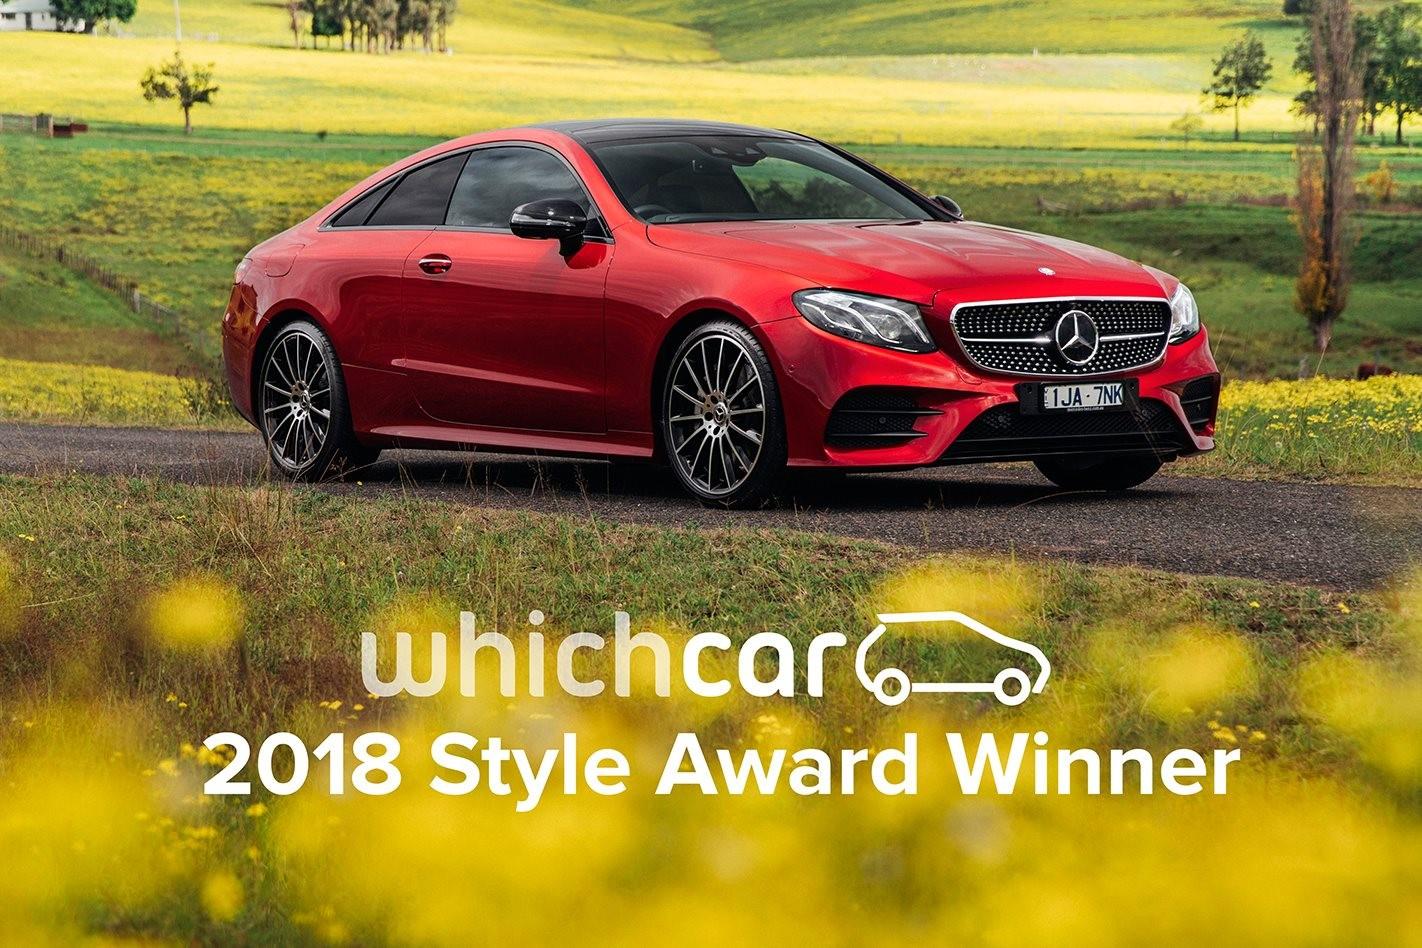 2018 Mercedes-Benz E-Class Coupe wins WhichCar Style Award